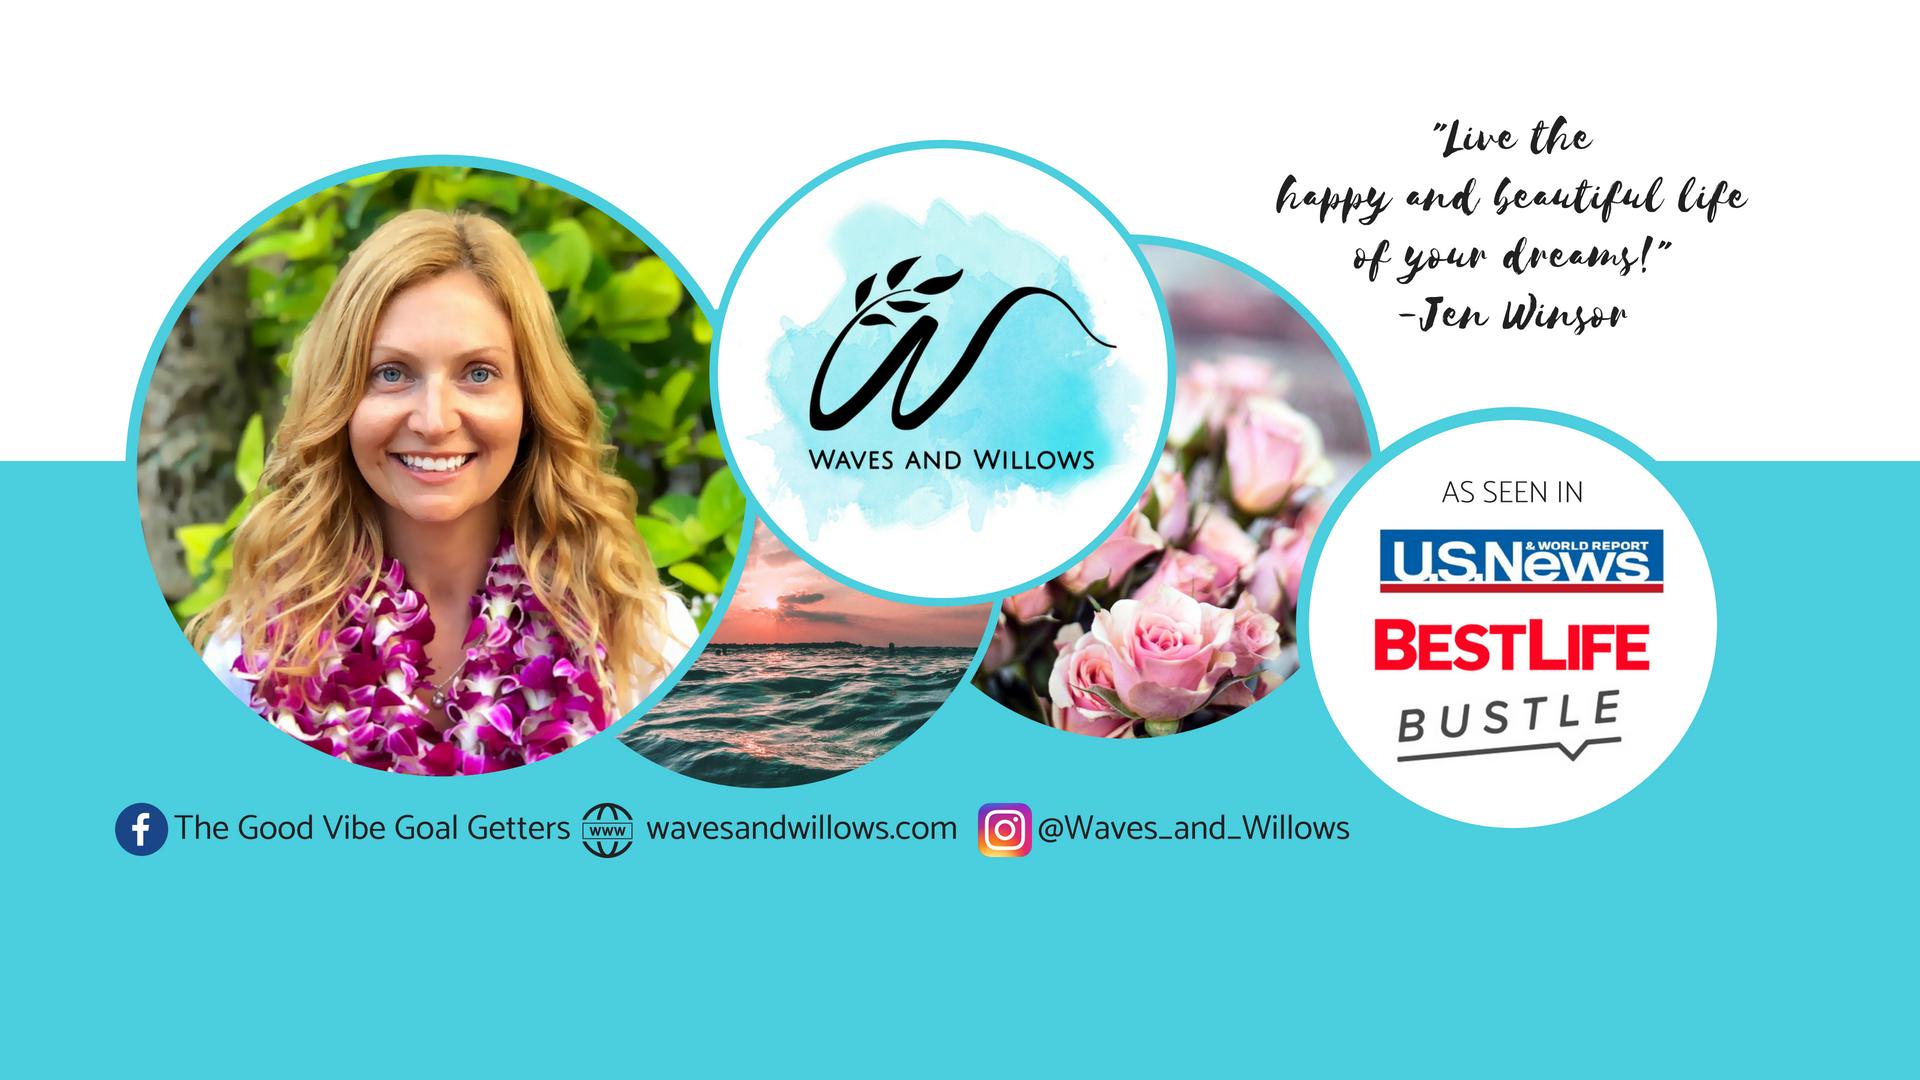 www.wavesandwillows.com